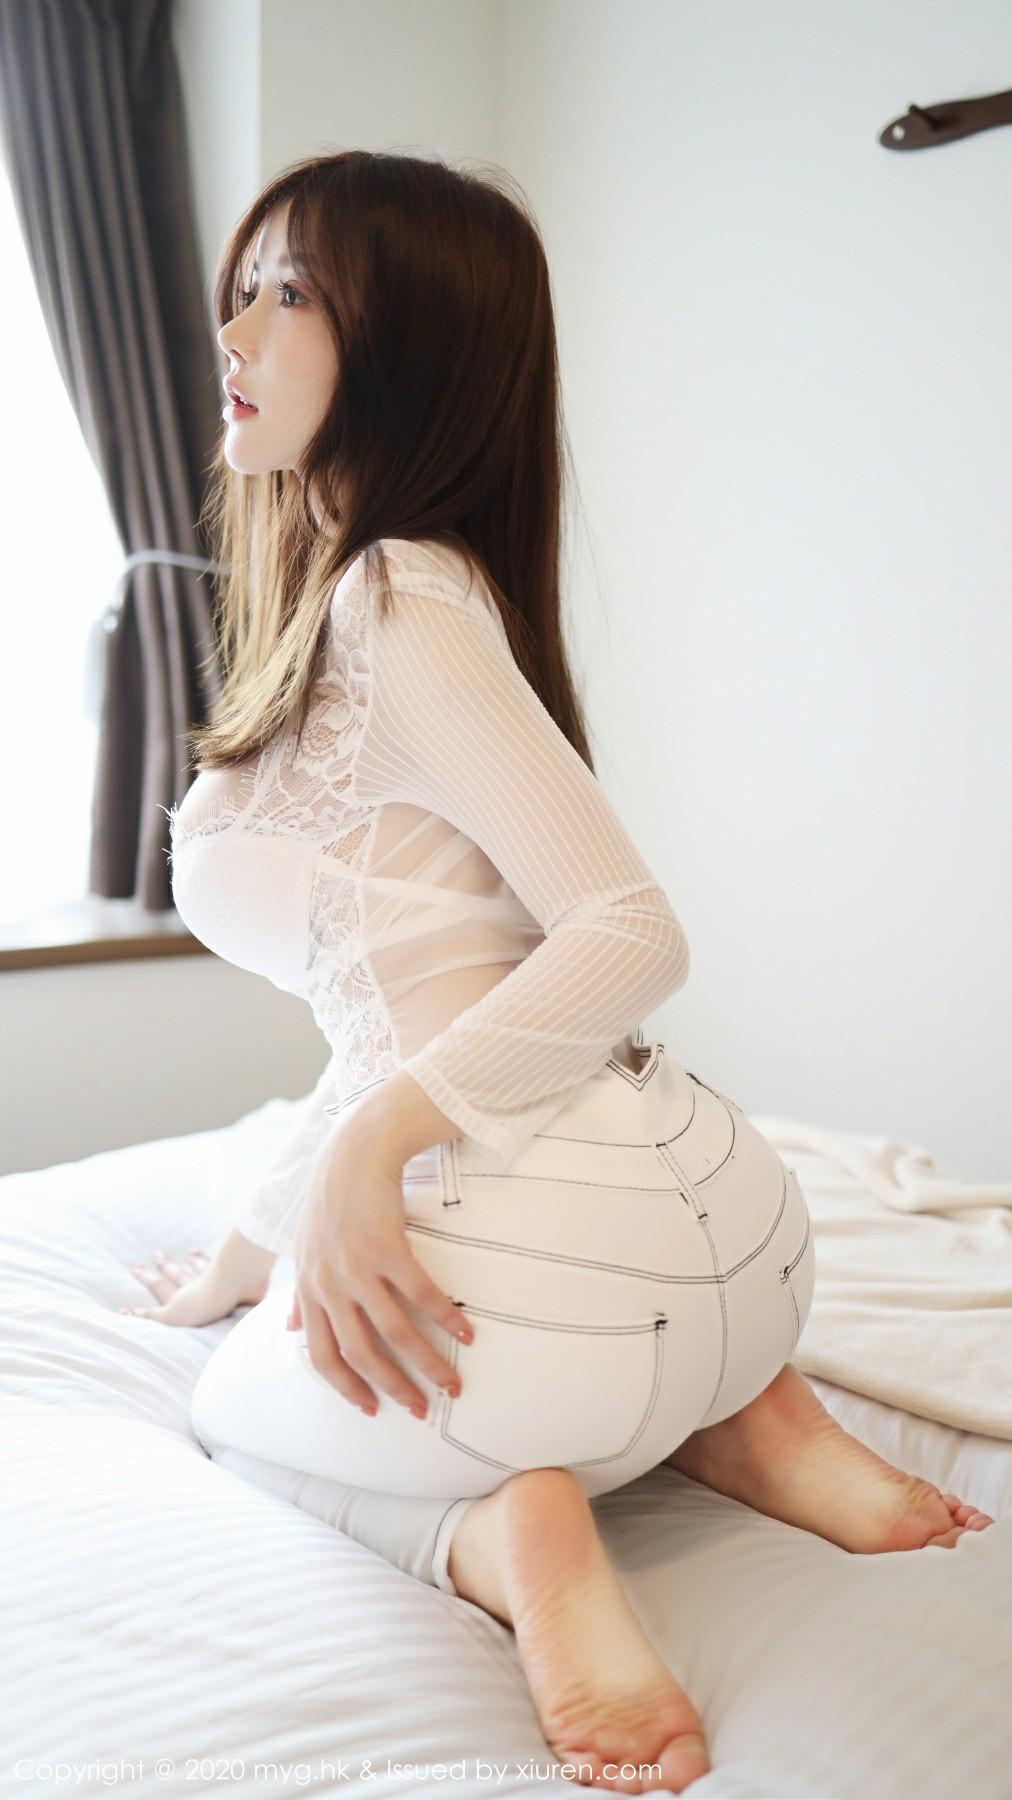 [MyGirl美媛馆]2020.01.21 VOL.428 糯美子Mini